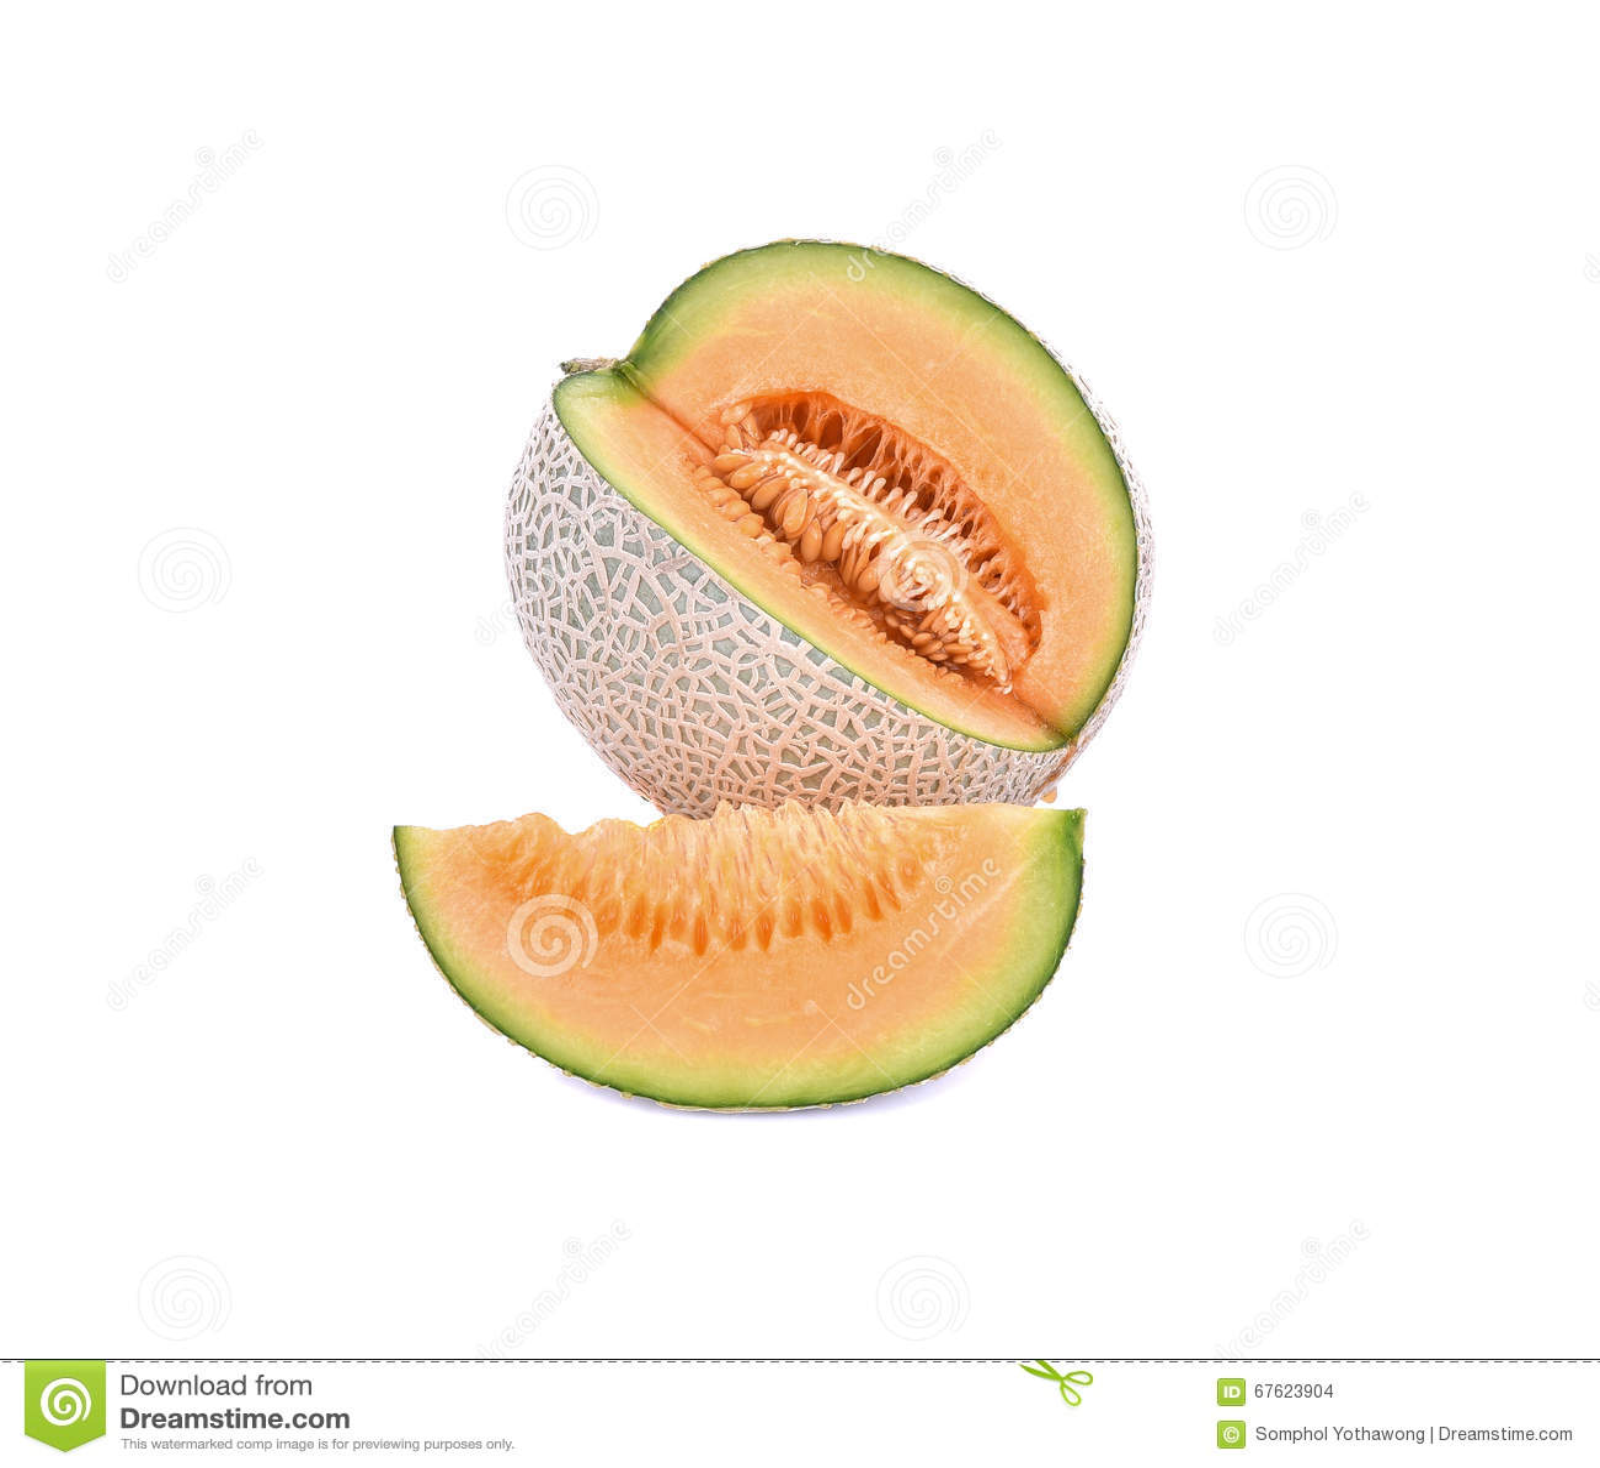 how to eat honeydew melon